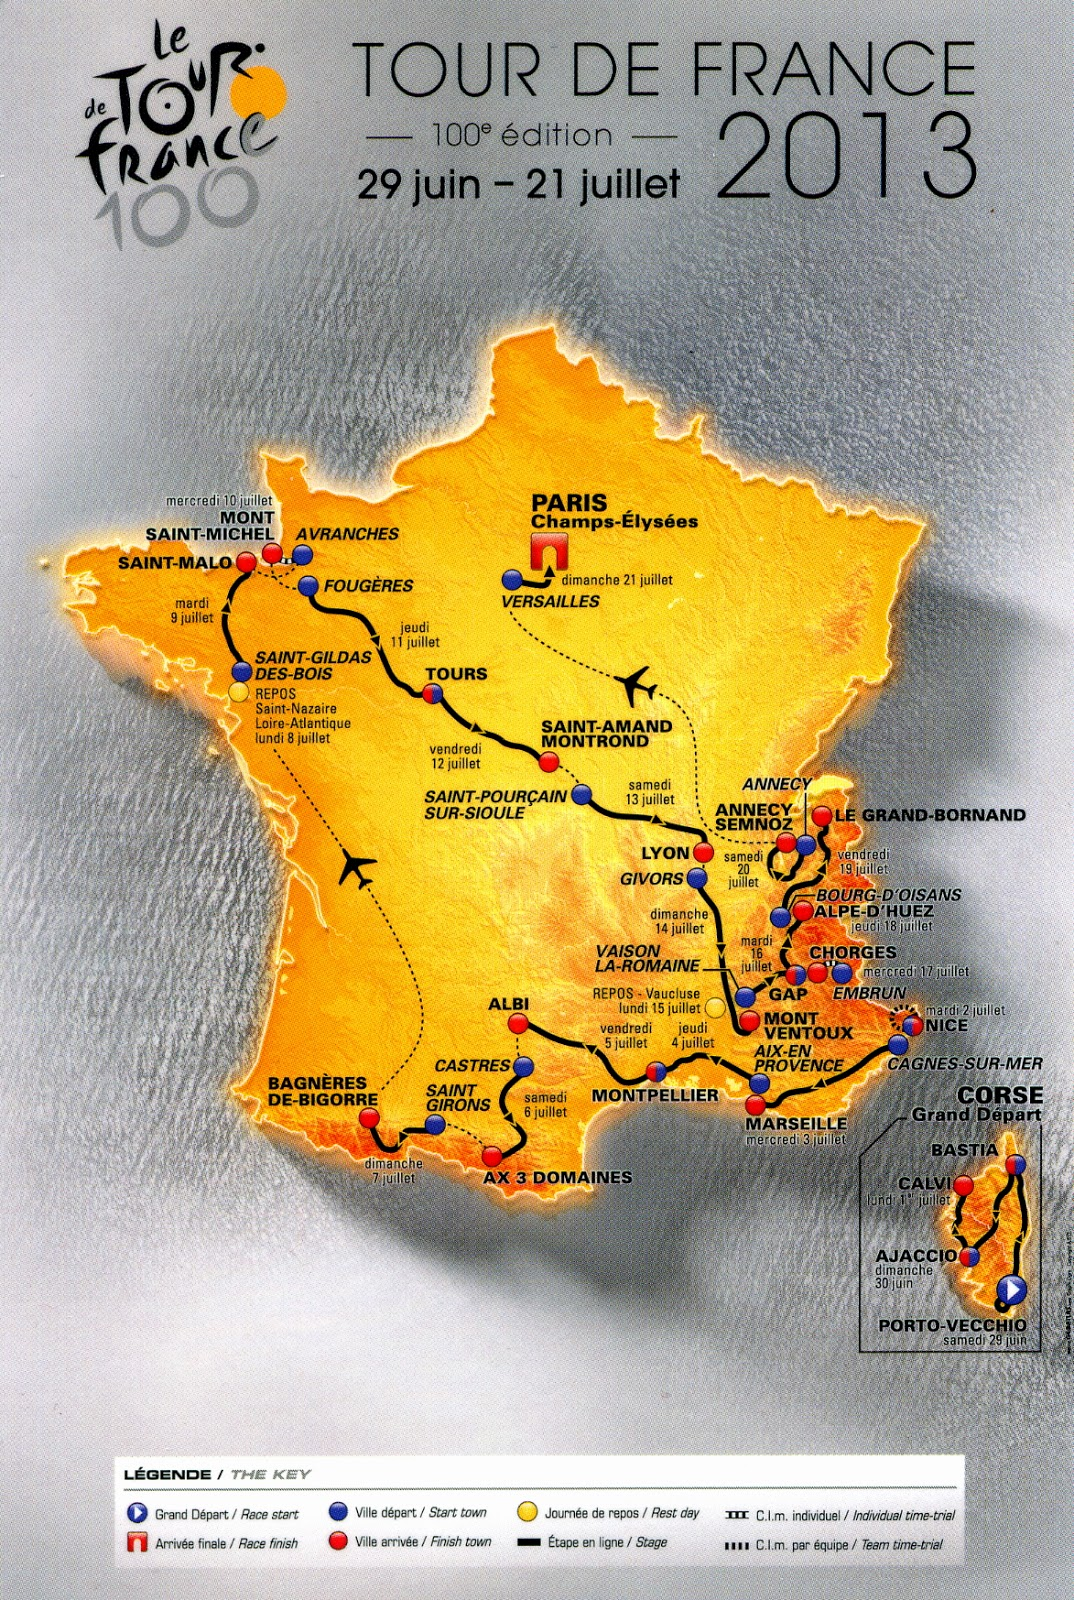 Tour de France 2013 • Carte • PopulationData.net